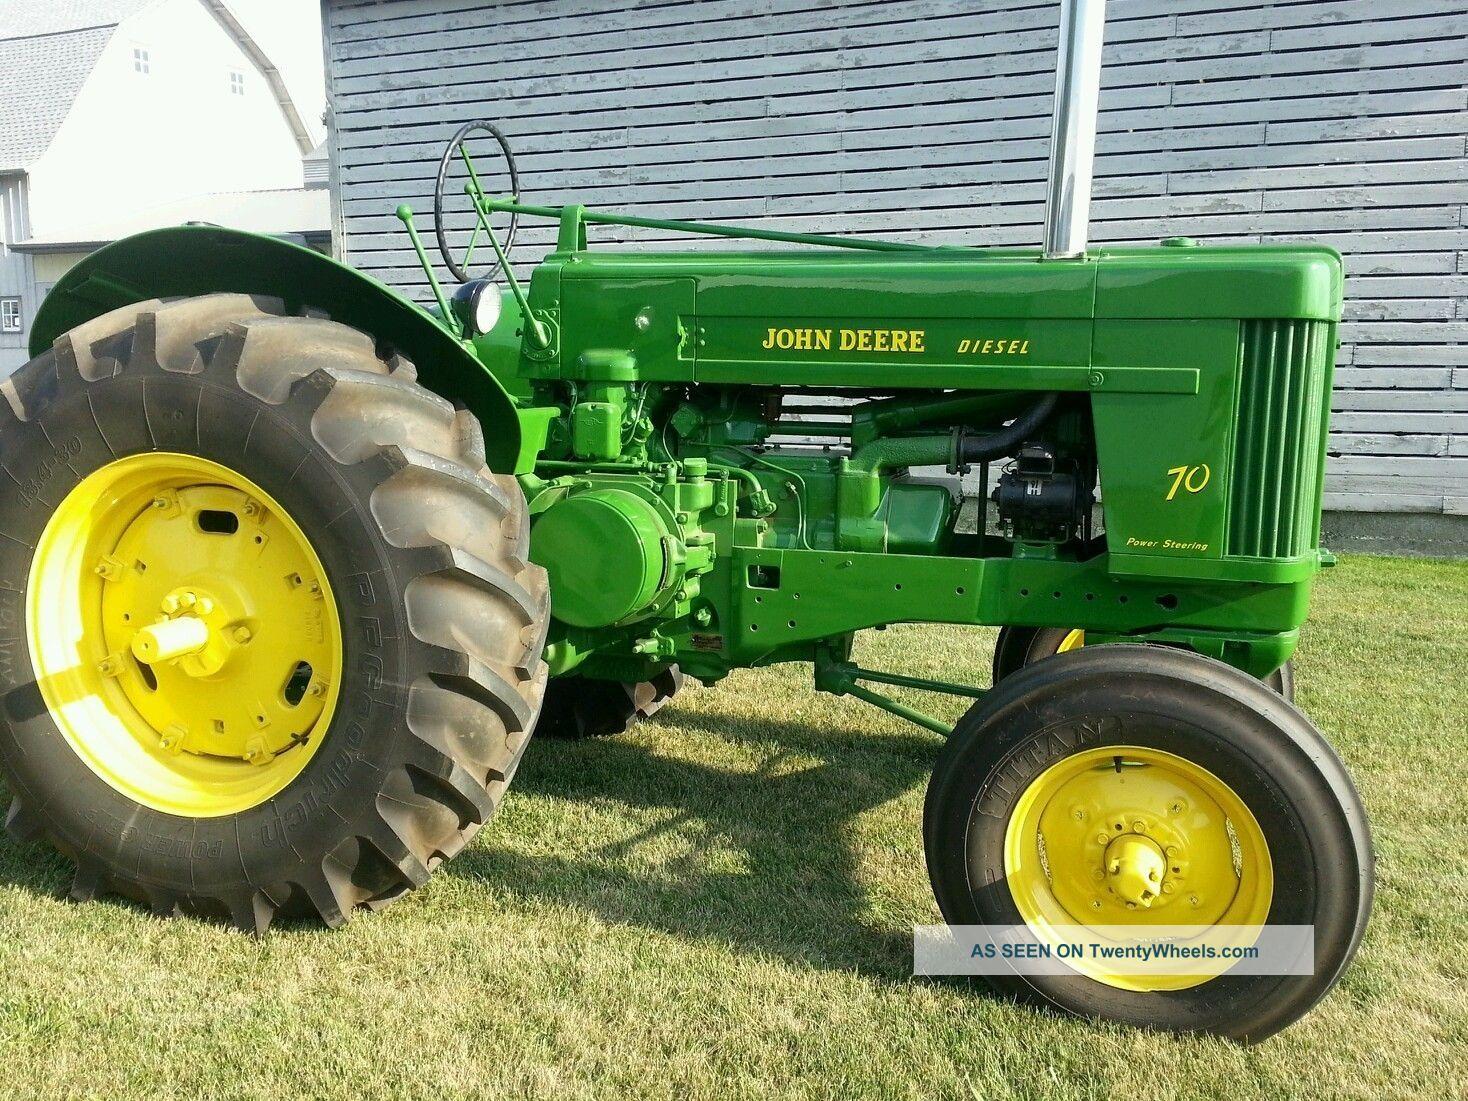 John Deere 70s Tractor Standard Diesel G 720 730 50 60 80